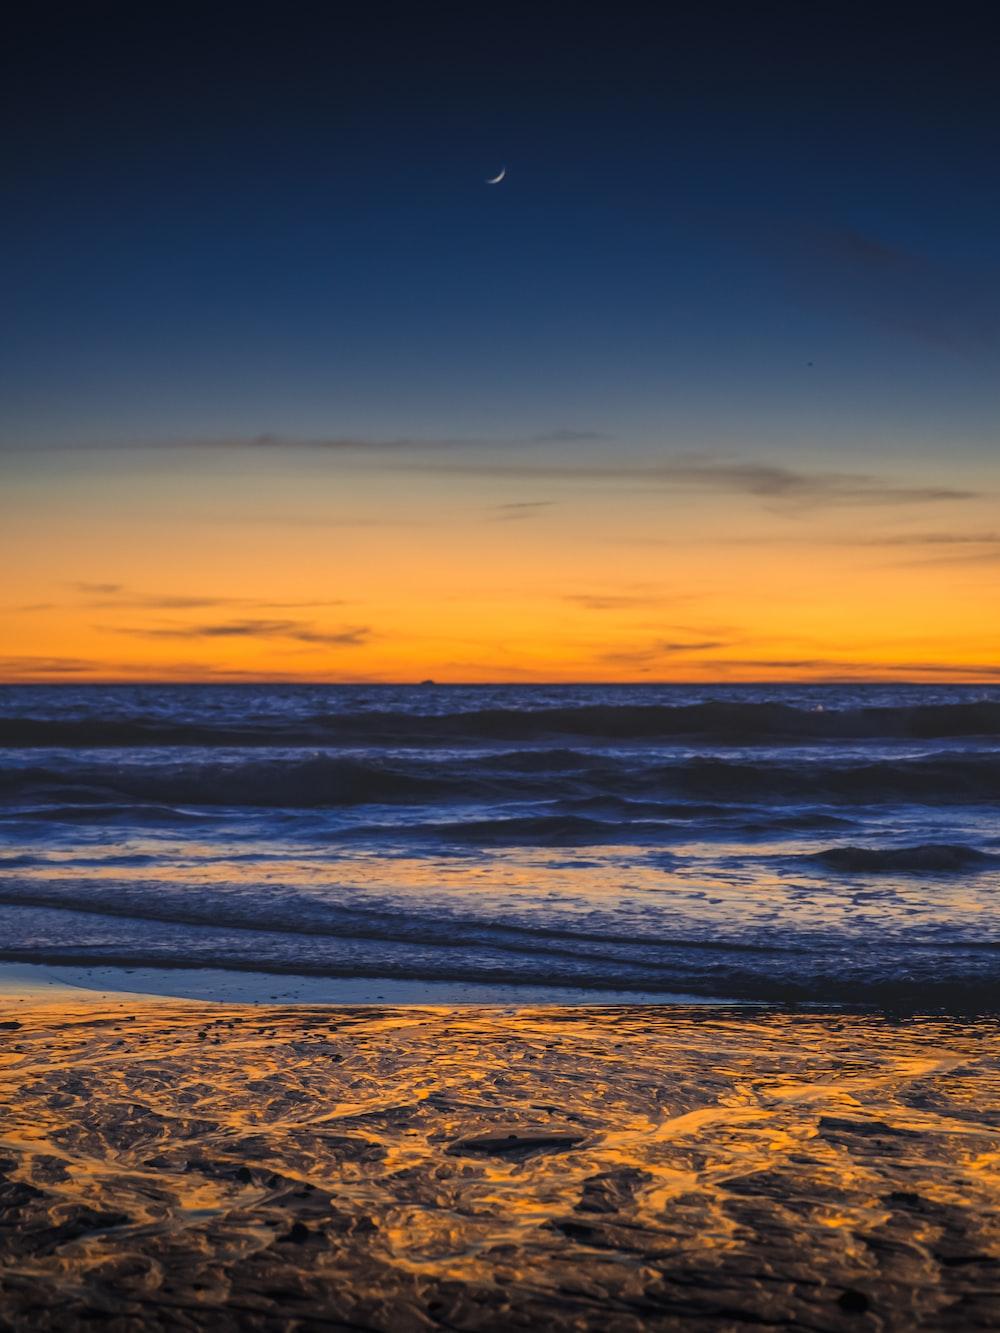 beach under blue sky during golden hour